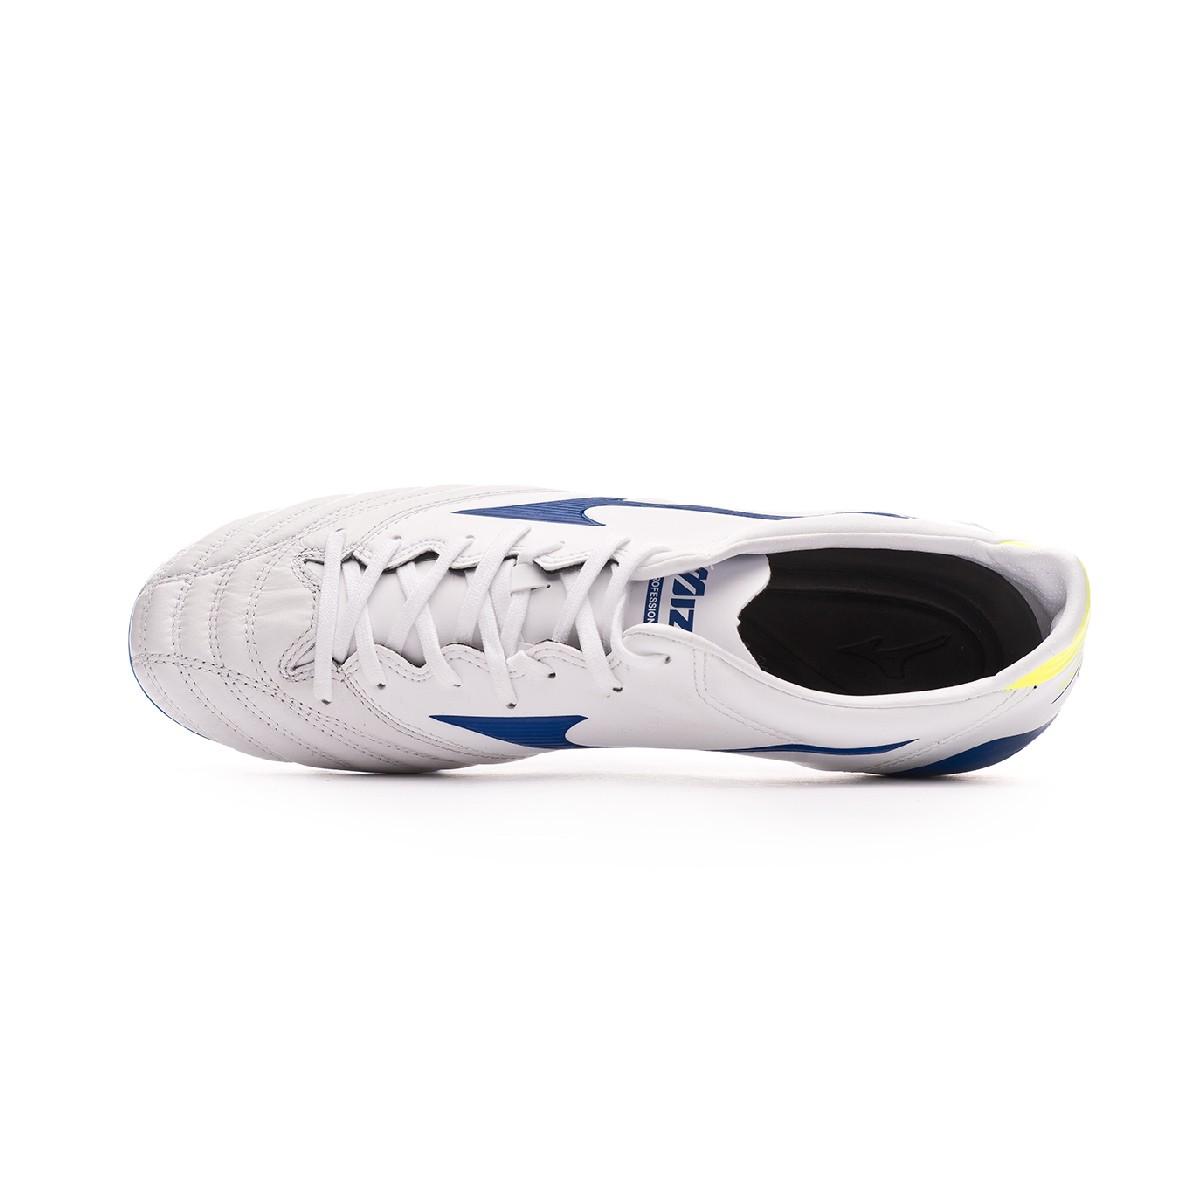 b213422f56a3a Football Boots Mizuno Morelia Neo KL II White-Wave cup blue-Safety yellow - Tienda  de fútbol Fútbol Emotion